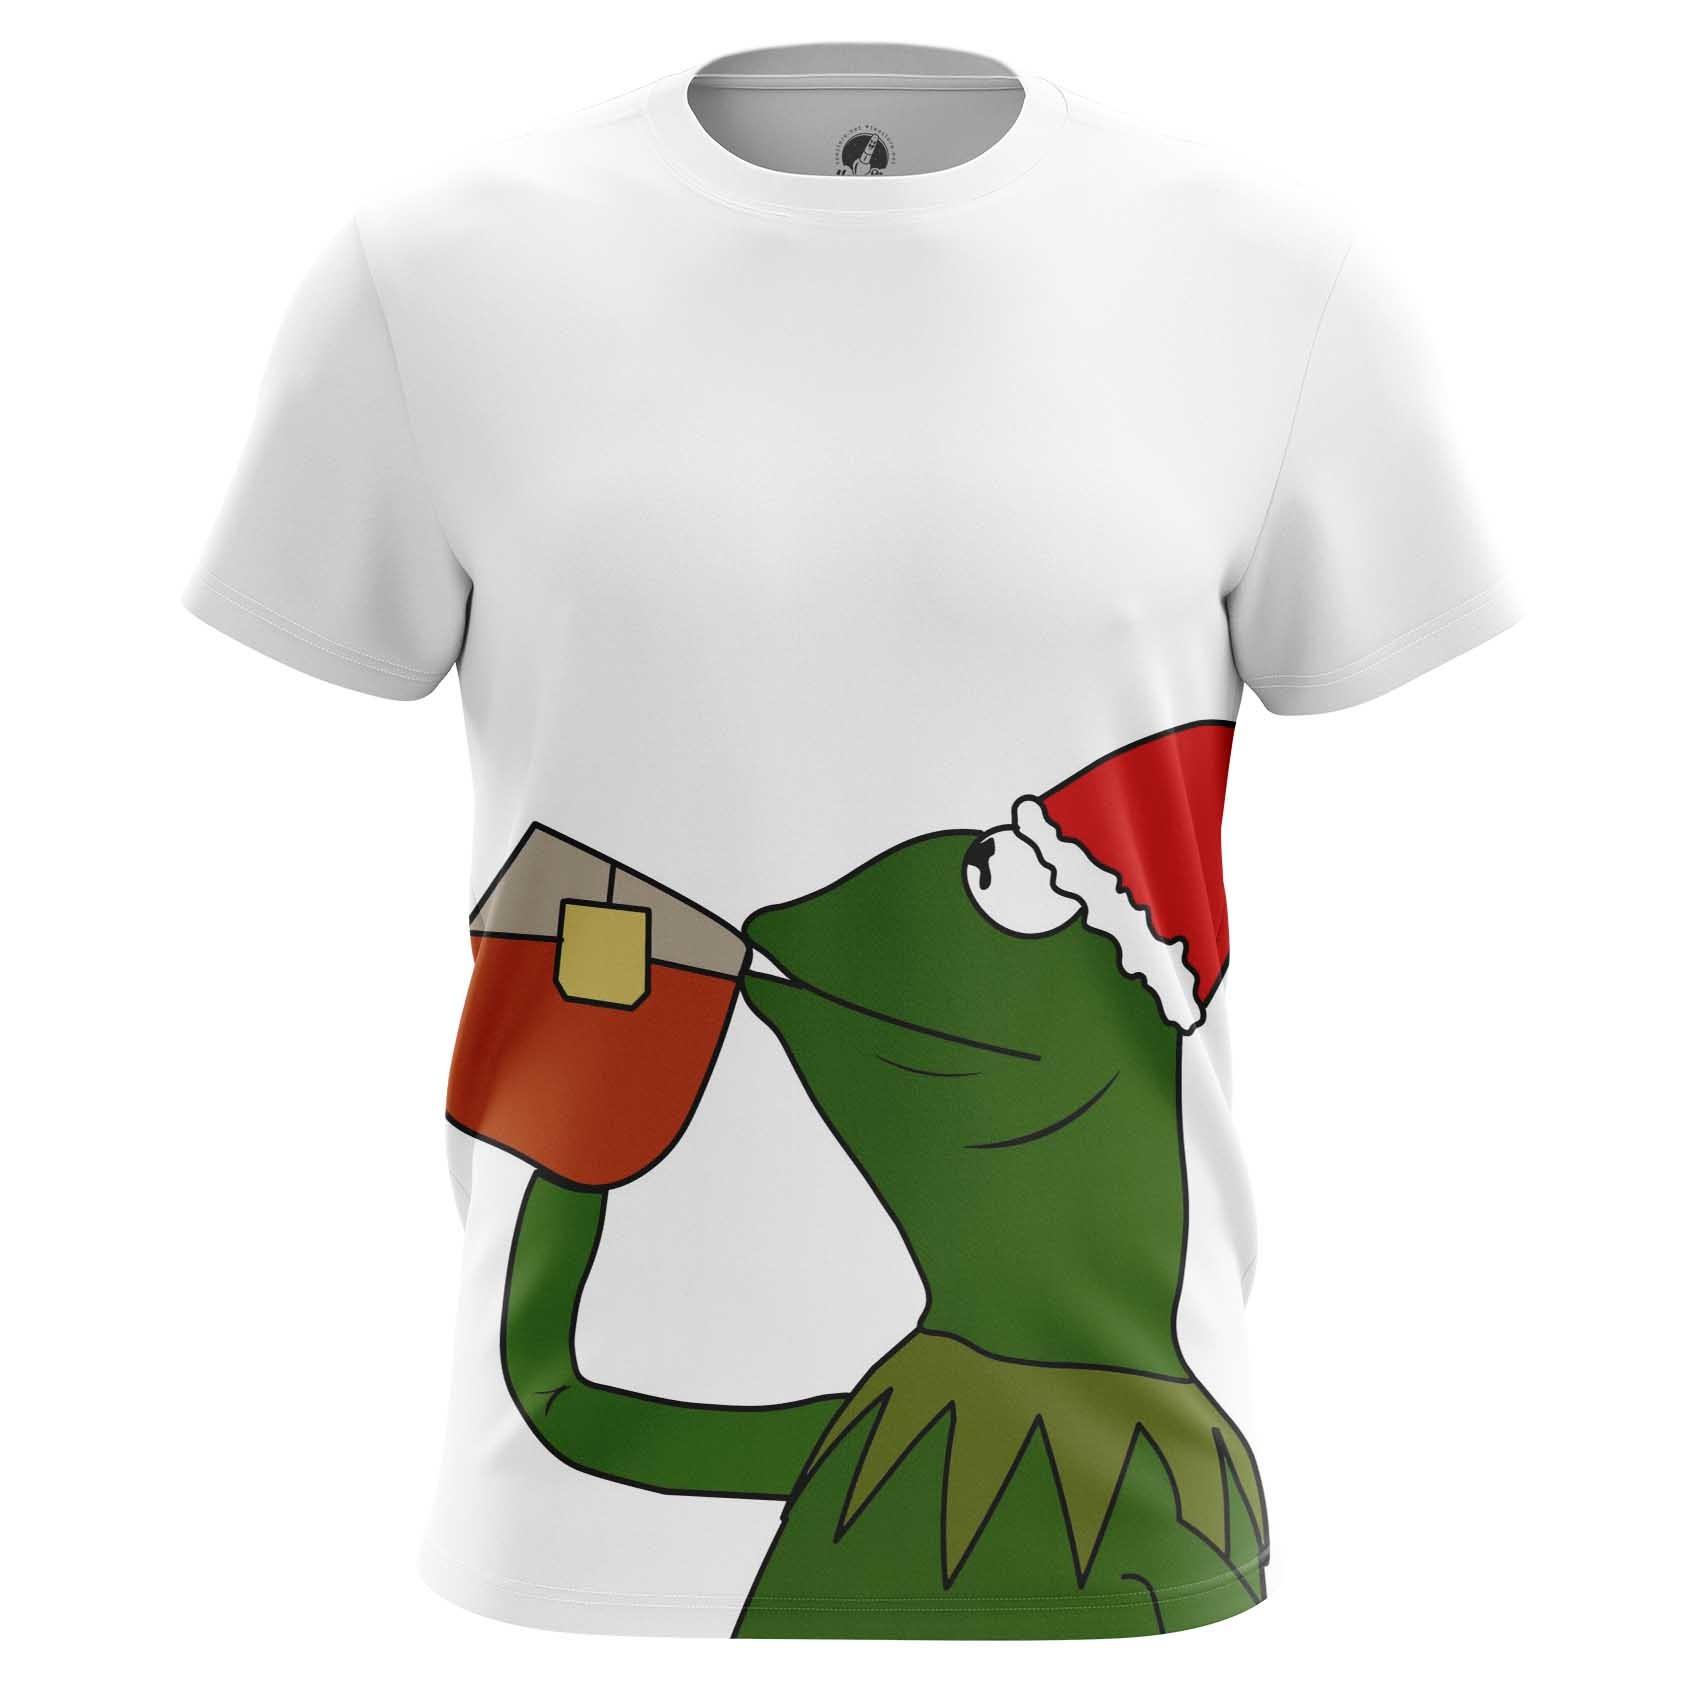 Collectibles T-Shirt Kermit Frog Christmas Meme